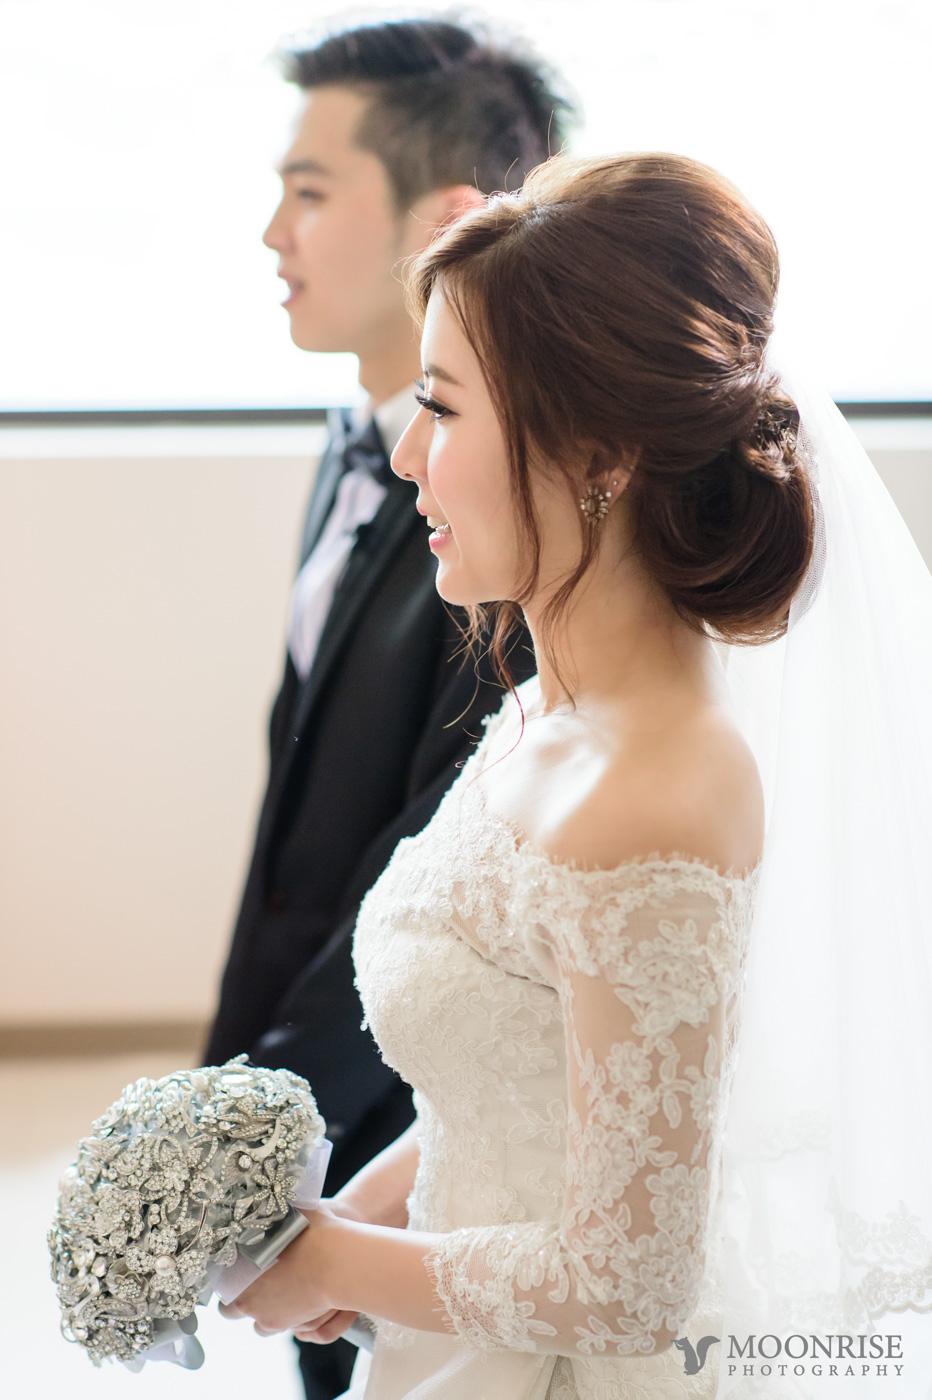 Moonrise_Wedding-0236